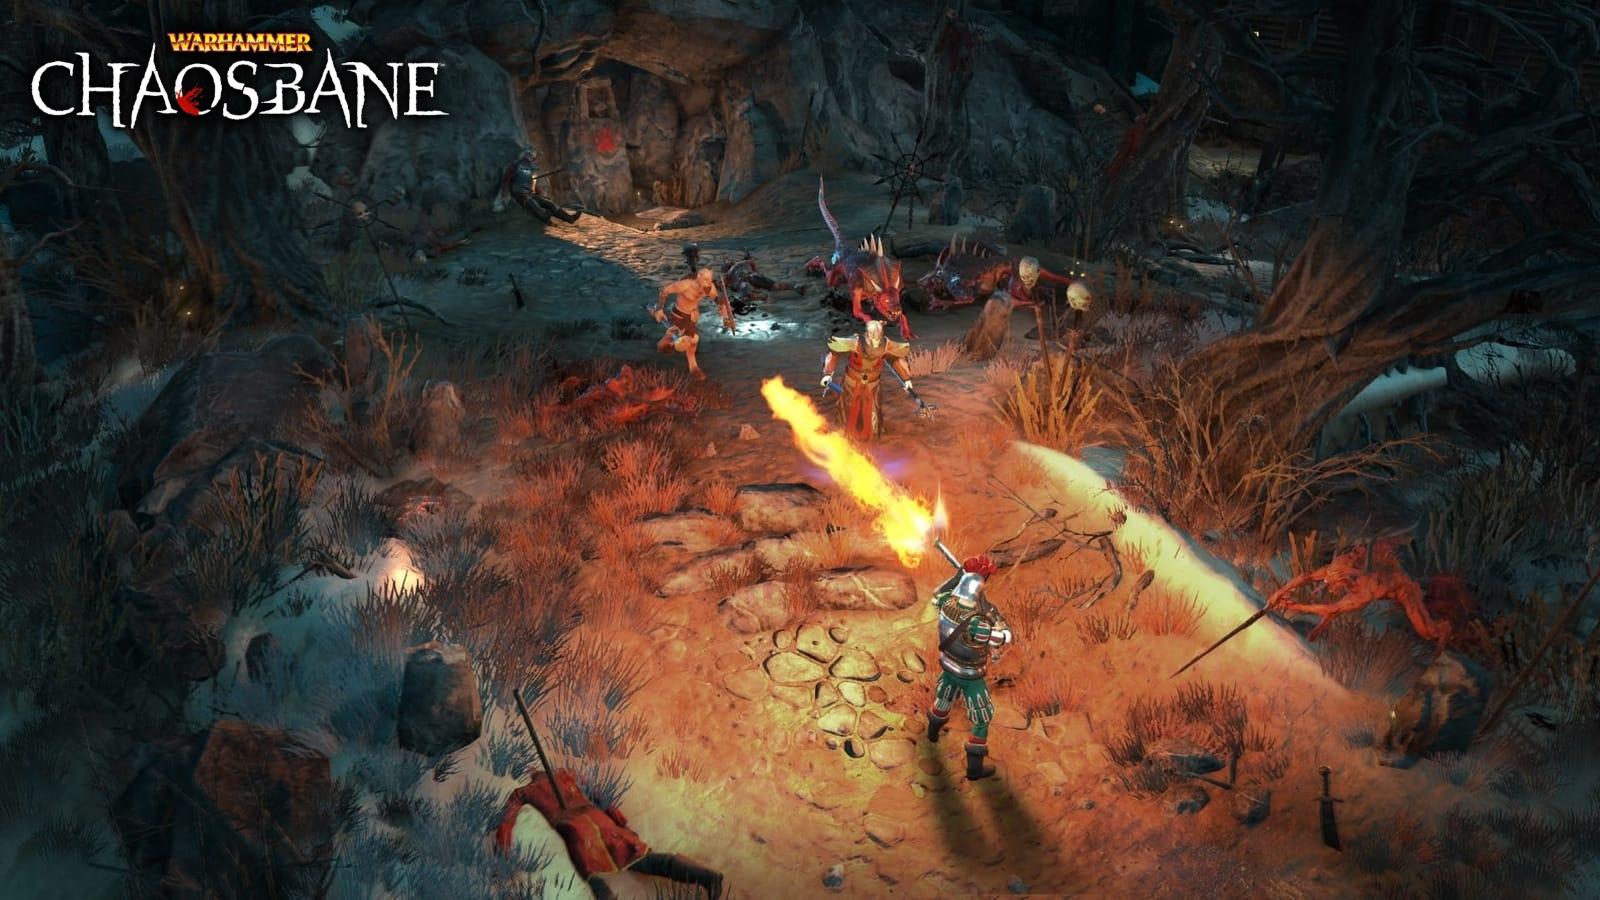 Warhammer Chaosbane 1022019 2